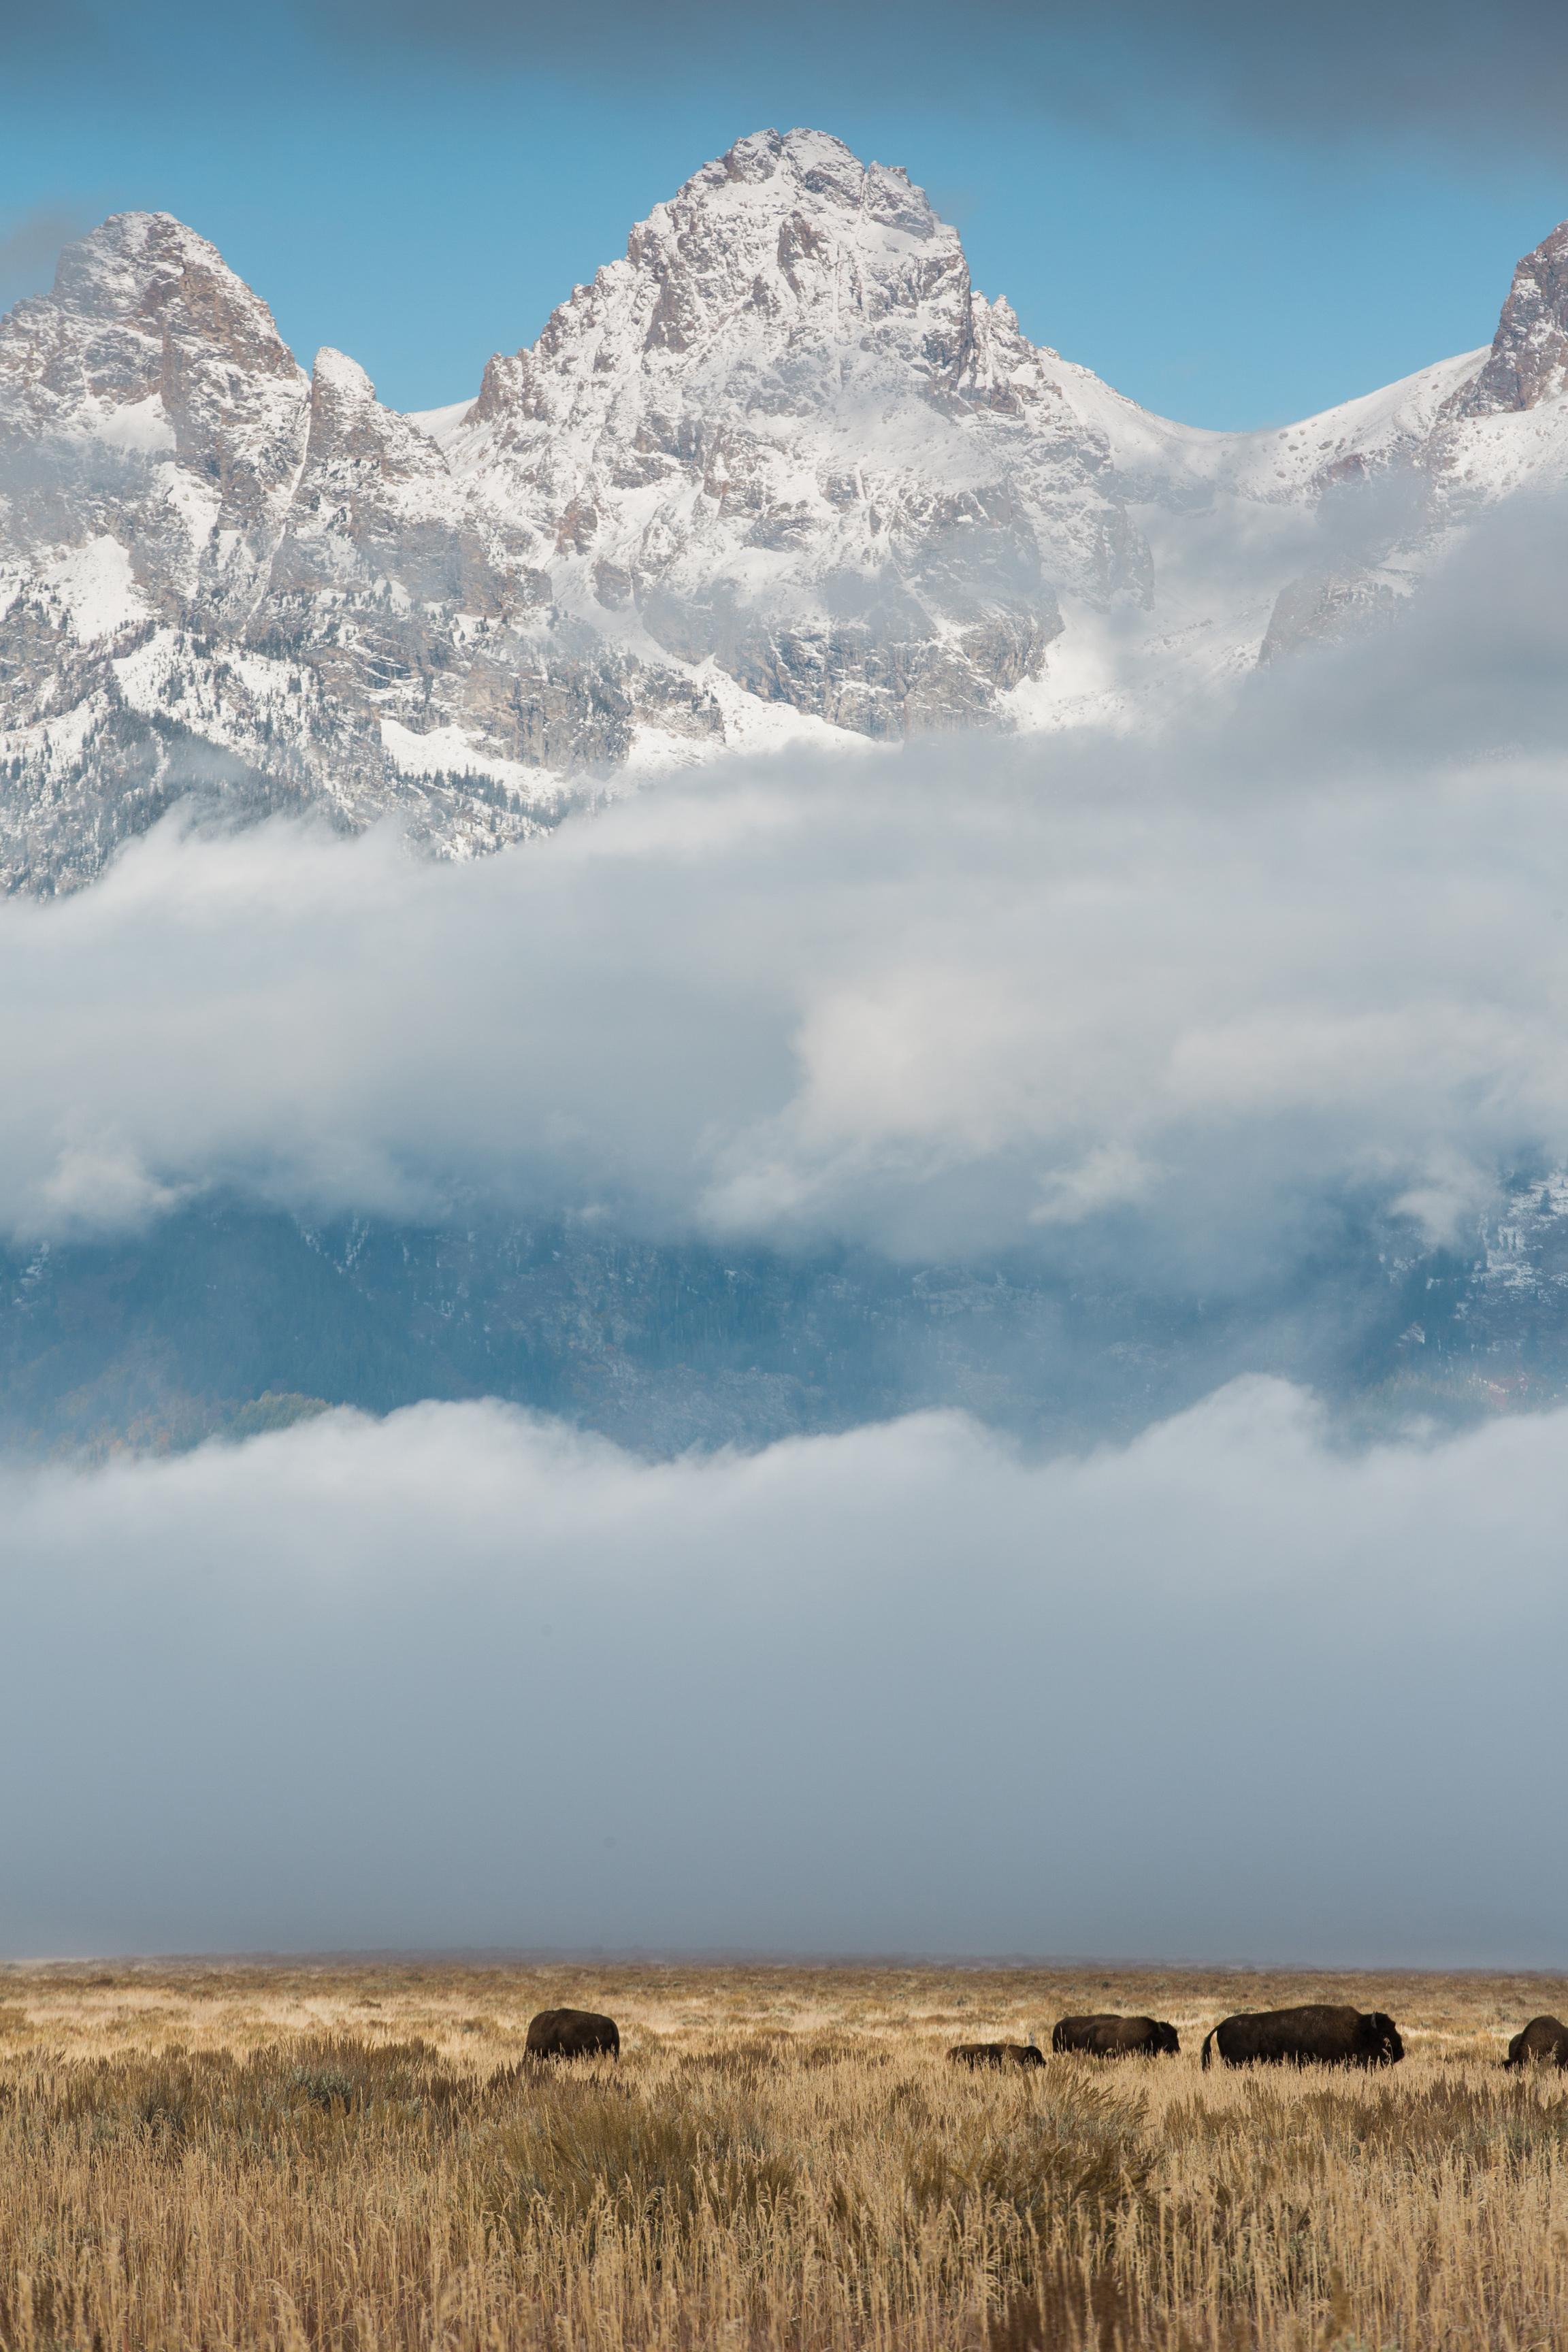 CindyGiovagnoli_outdoor_adventure_photography_Grand_Teton_Yellowstone_Glacier_National_Park_Montana_Wyoming_South_Dakota_Mount_Rushmore_Badlands-009.jpg